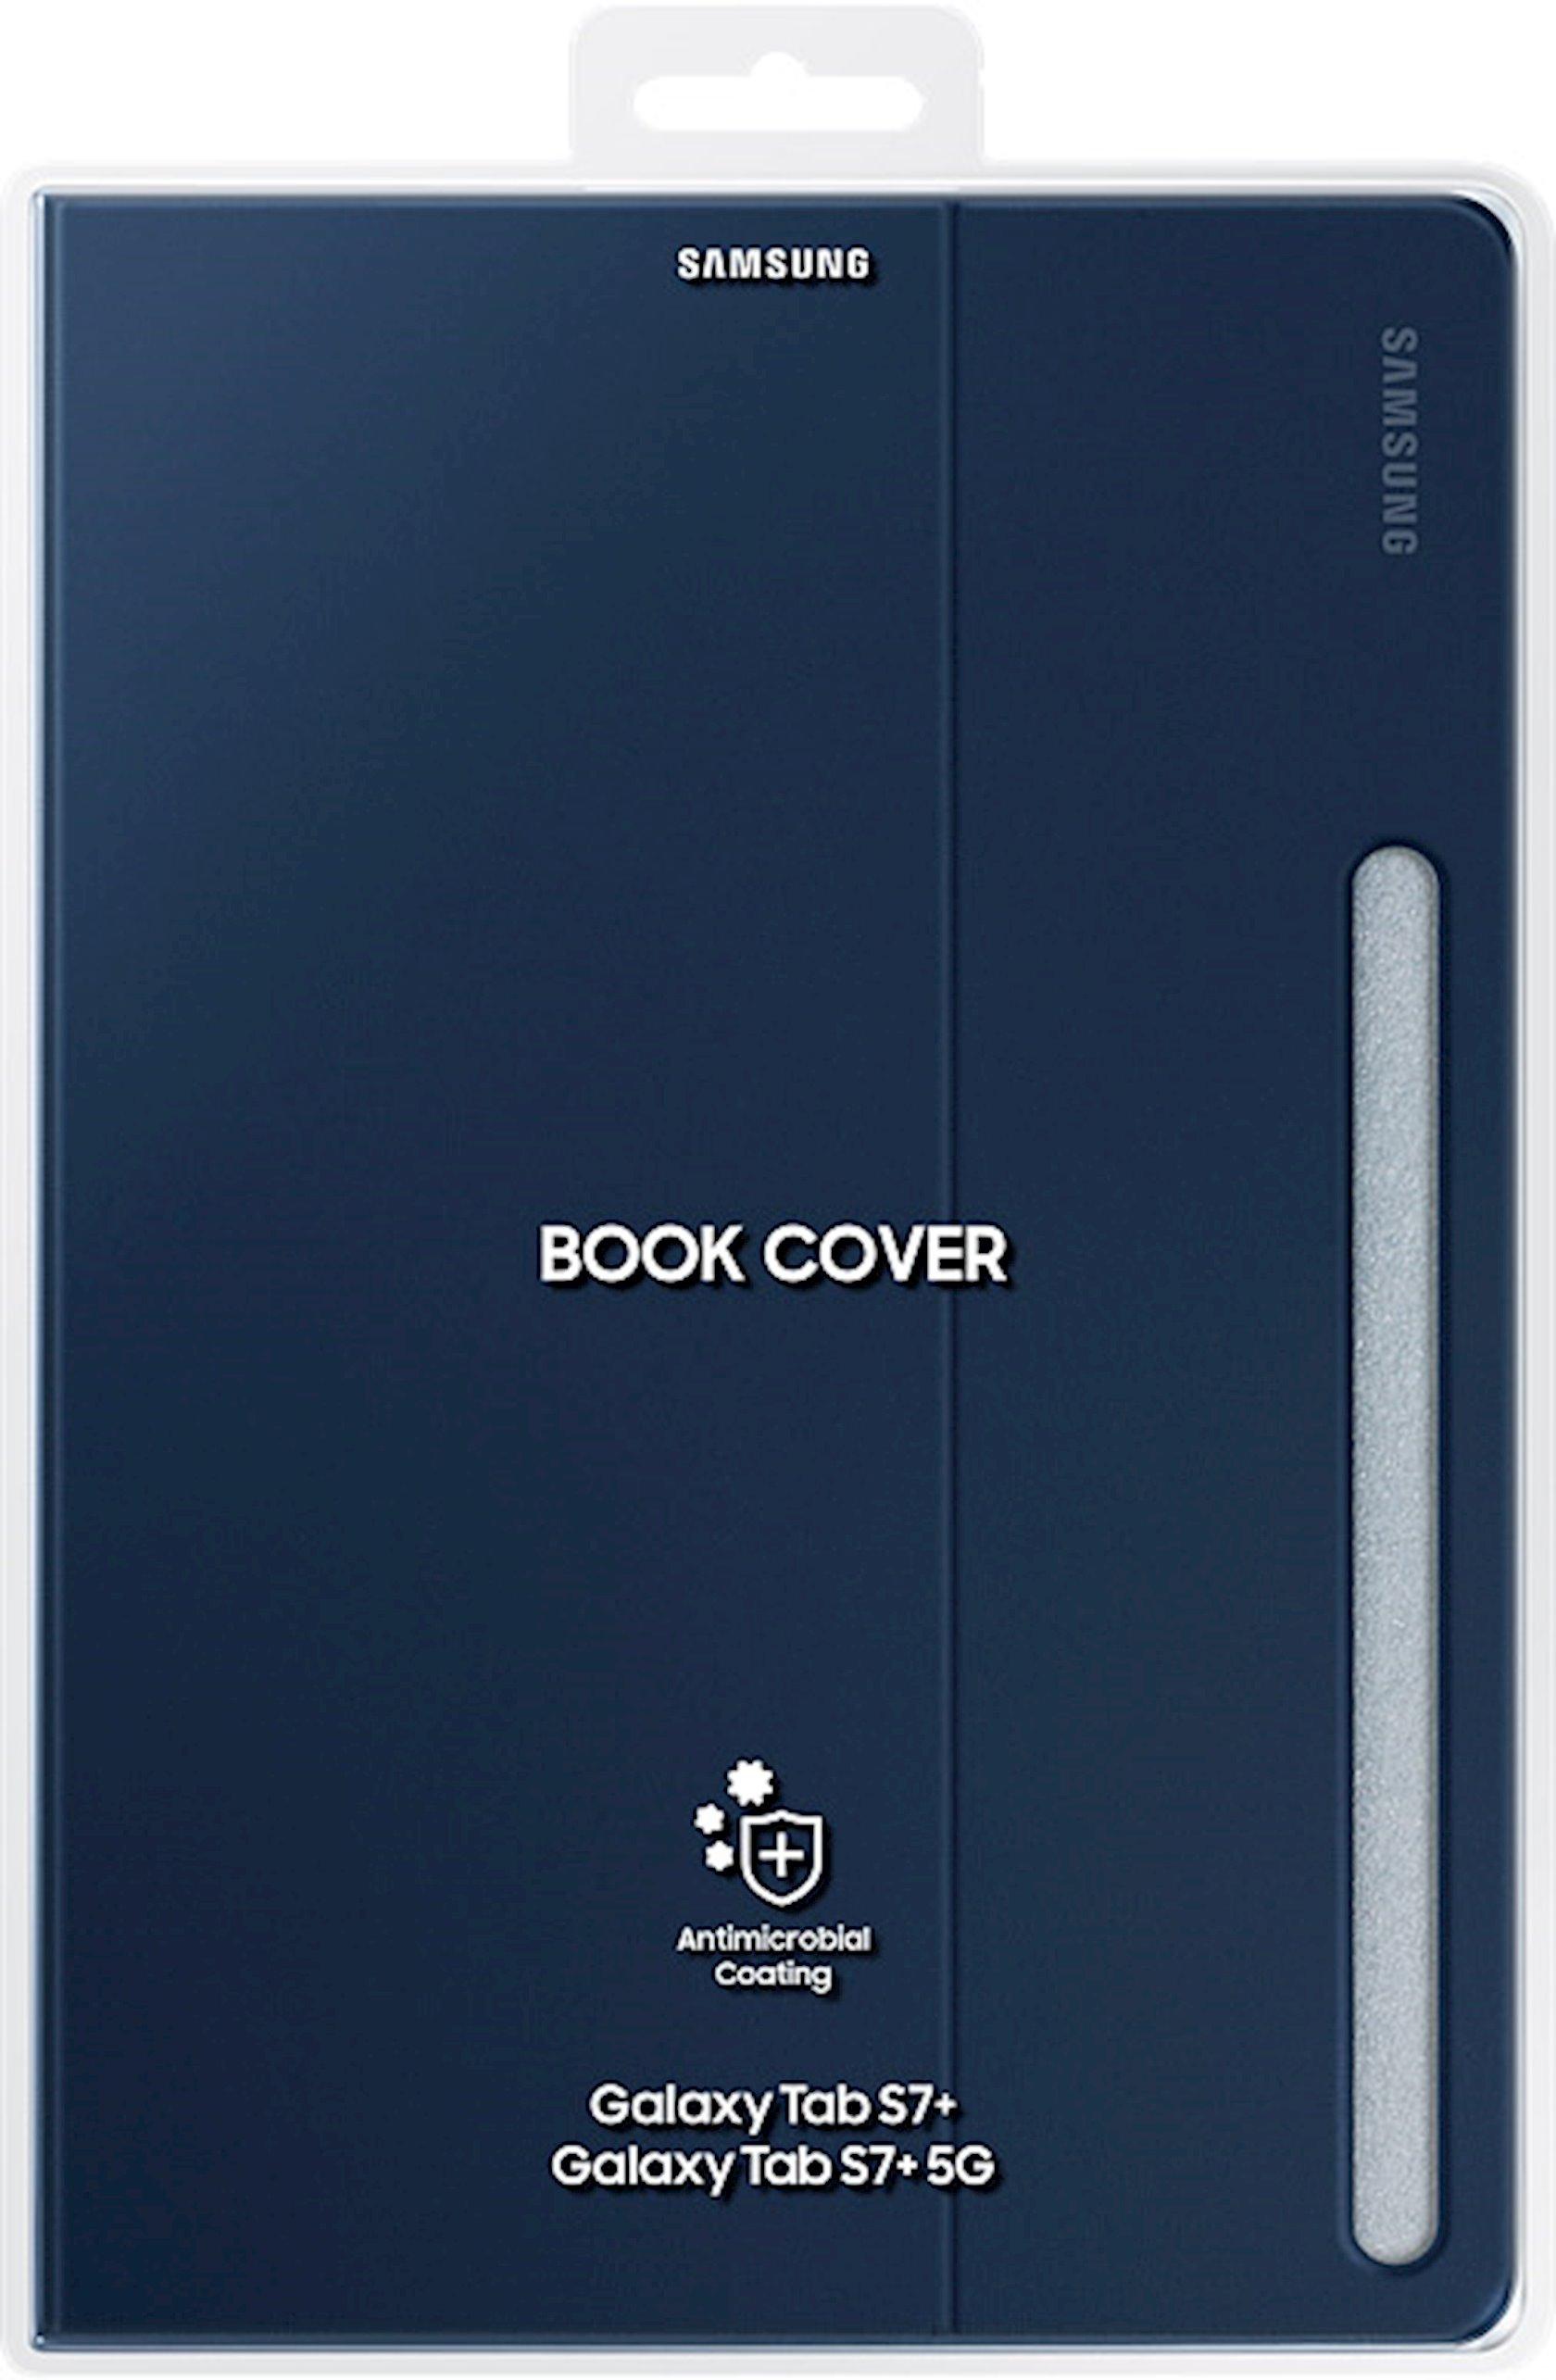 Çexol Samsung Book Cover Tab S7+ (EF-BT970PNEGRU)